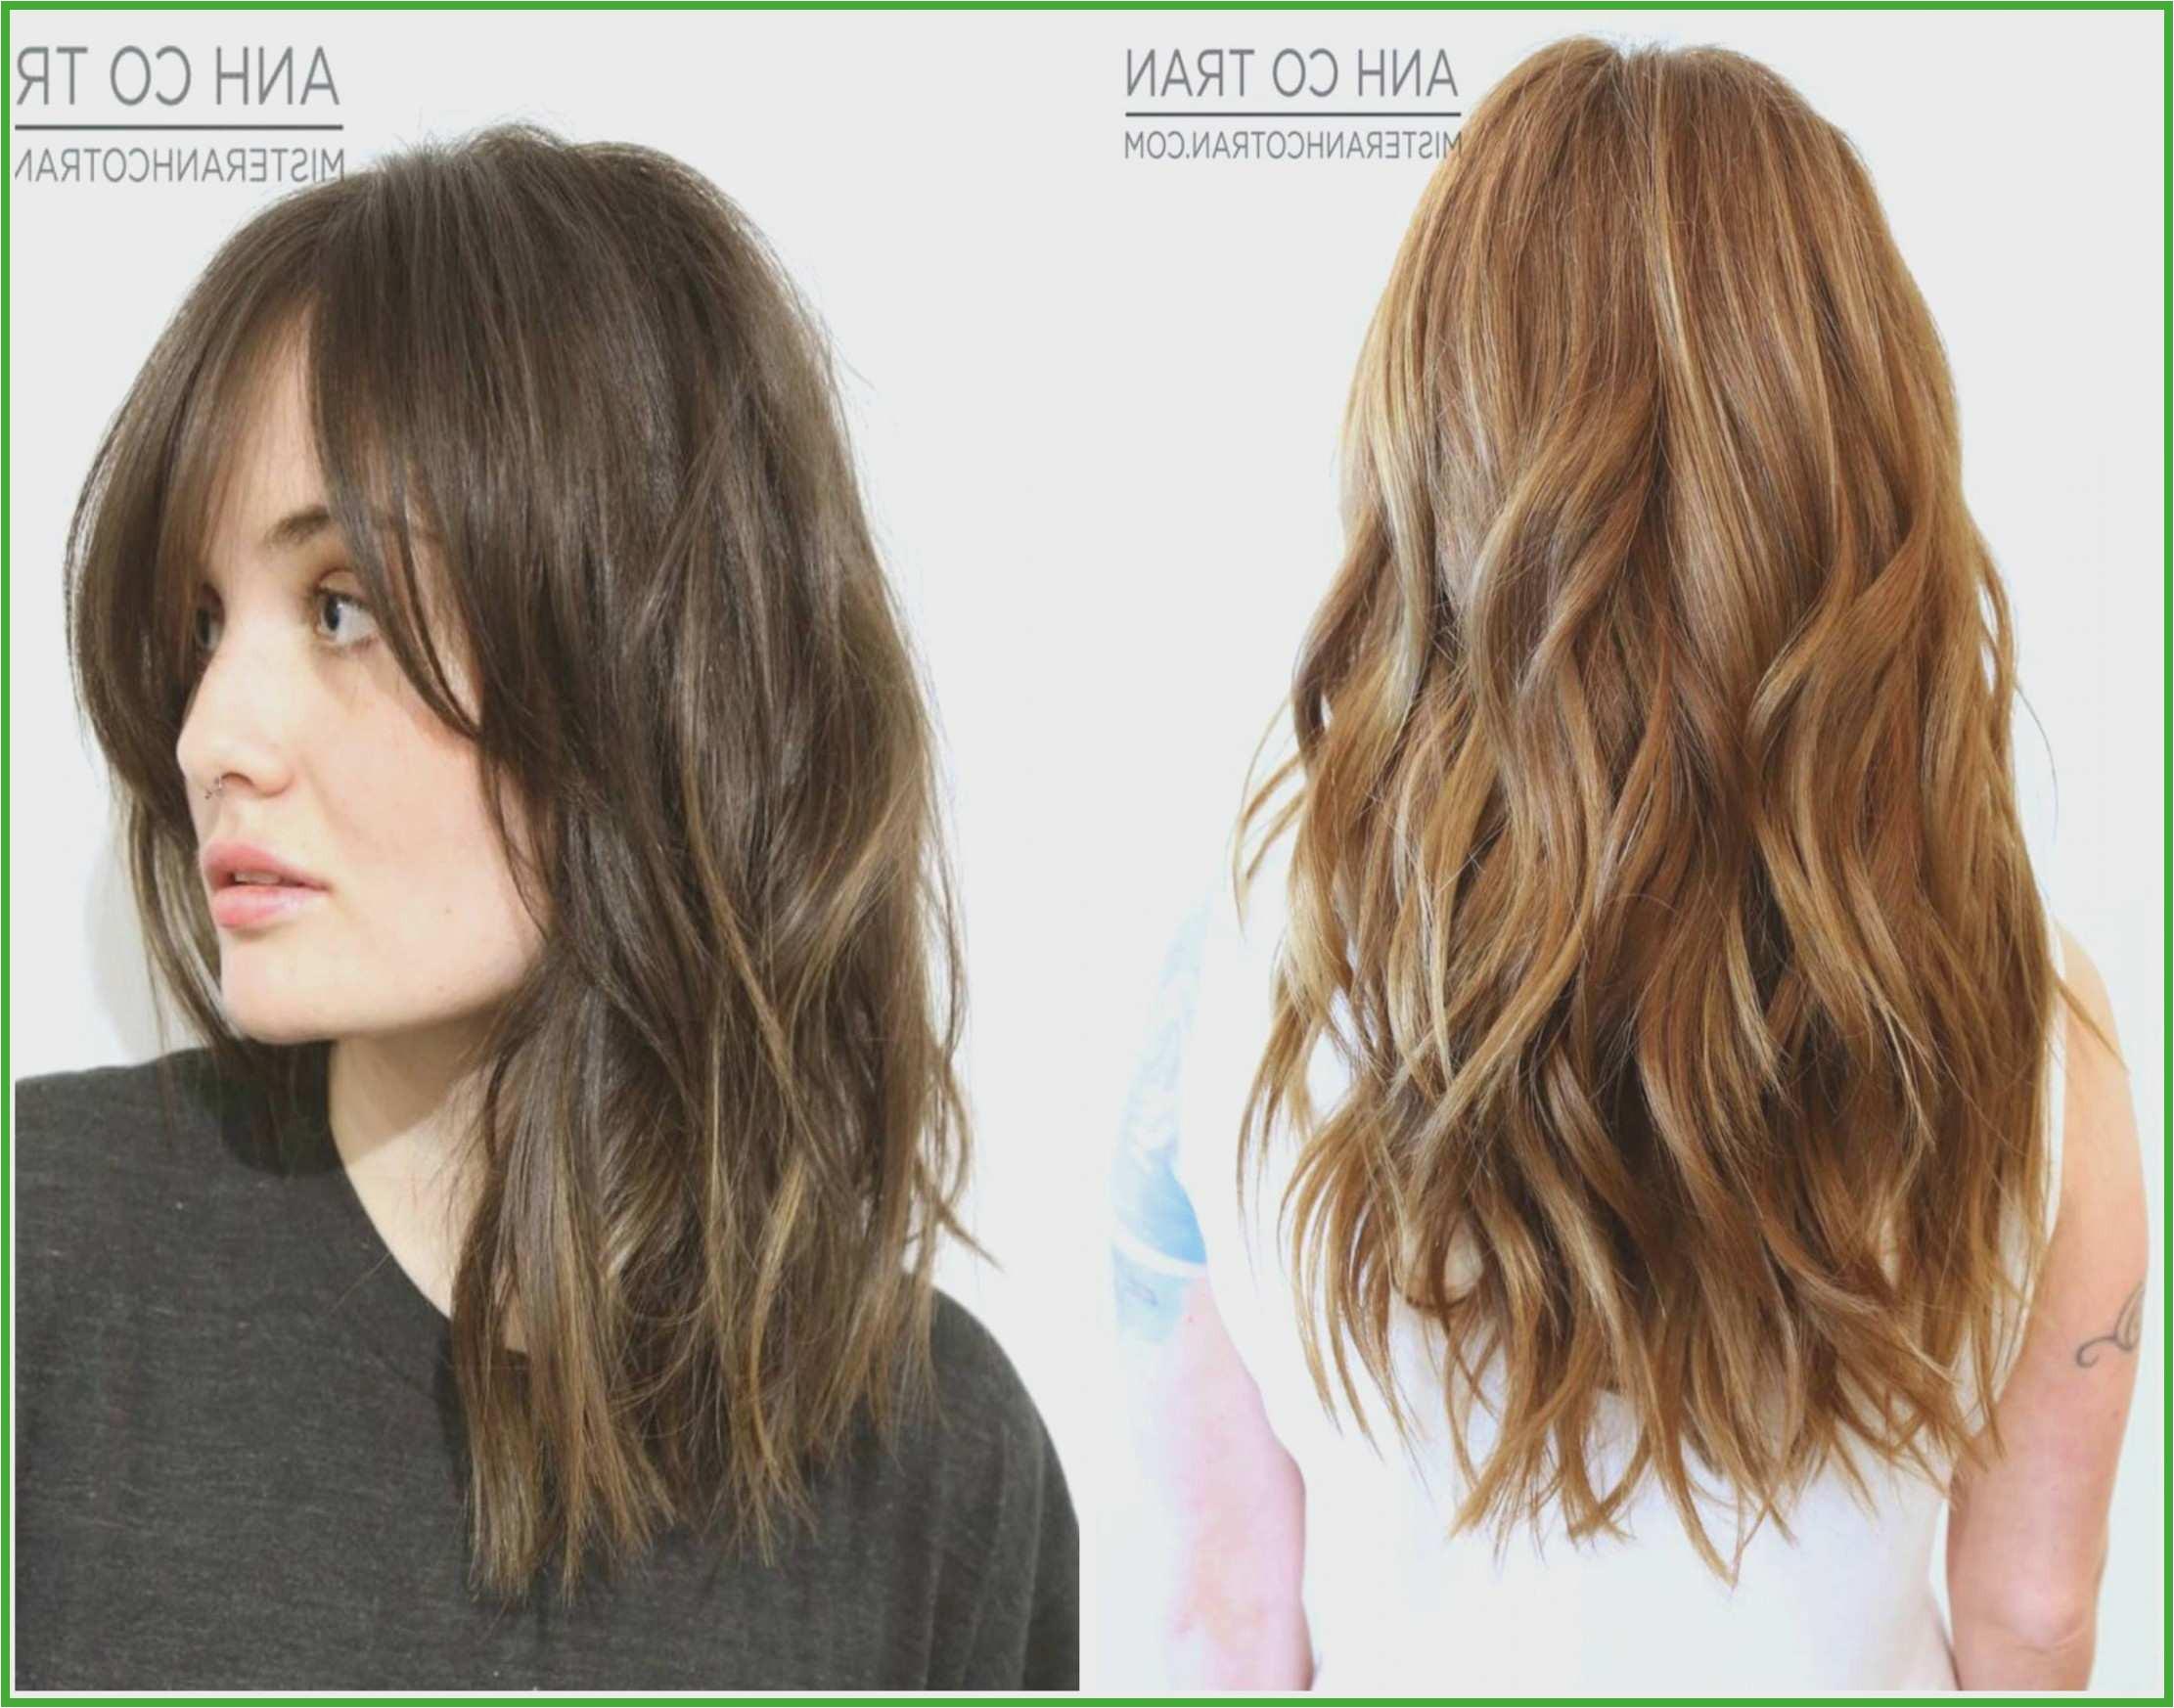 Highlights Asian Hair Lovely Medium Curled Hair Very Curly Hairstyles Fresh Curly Hair 0d